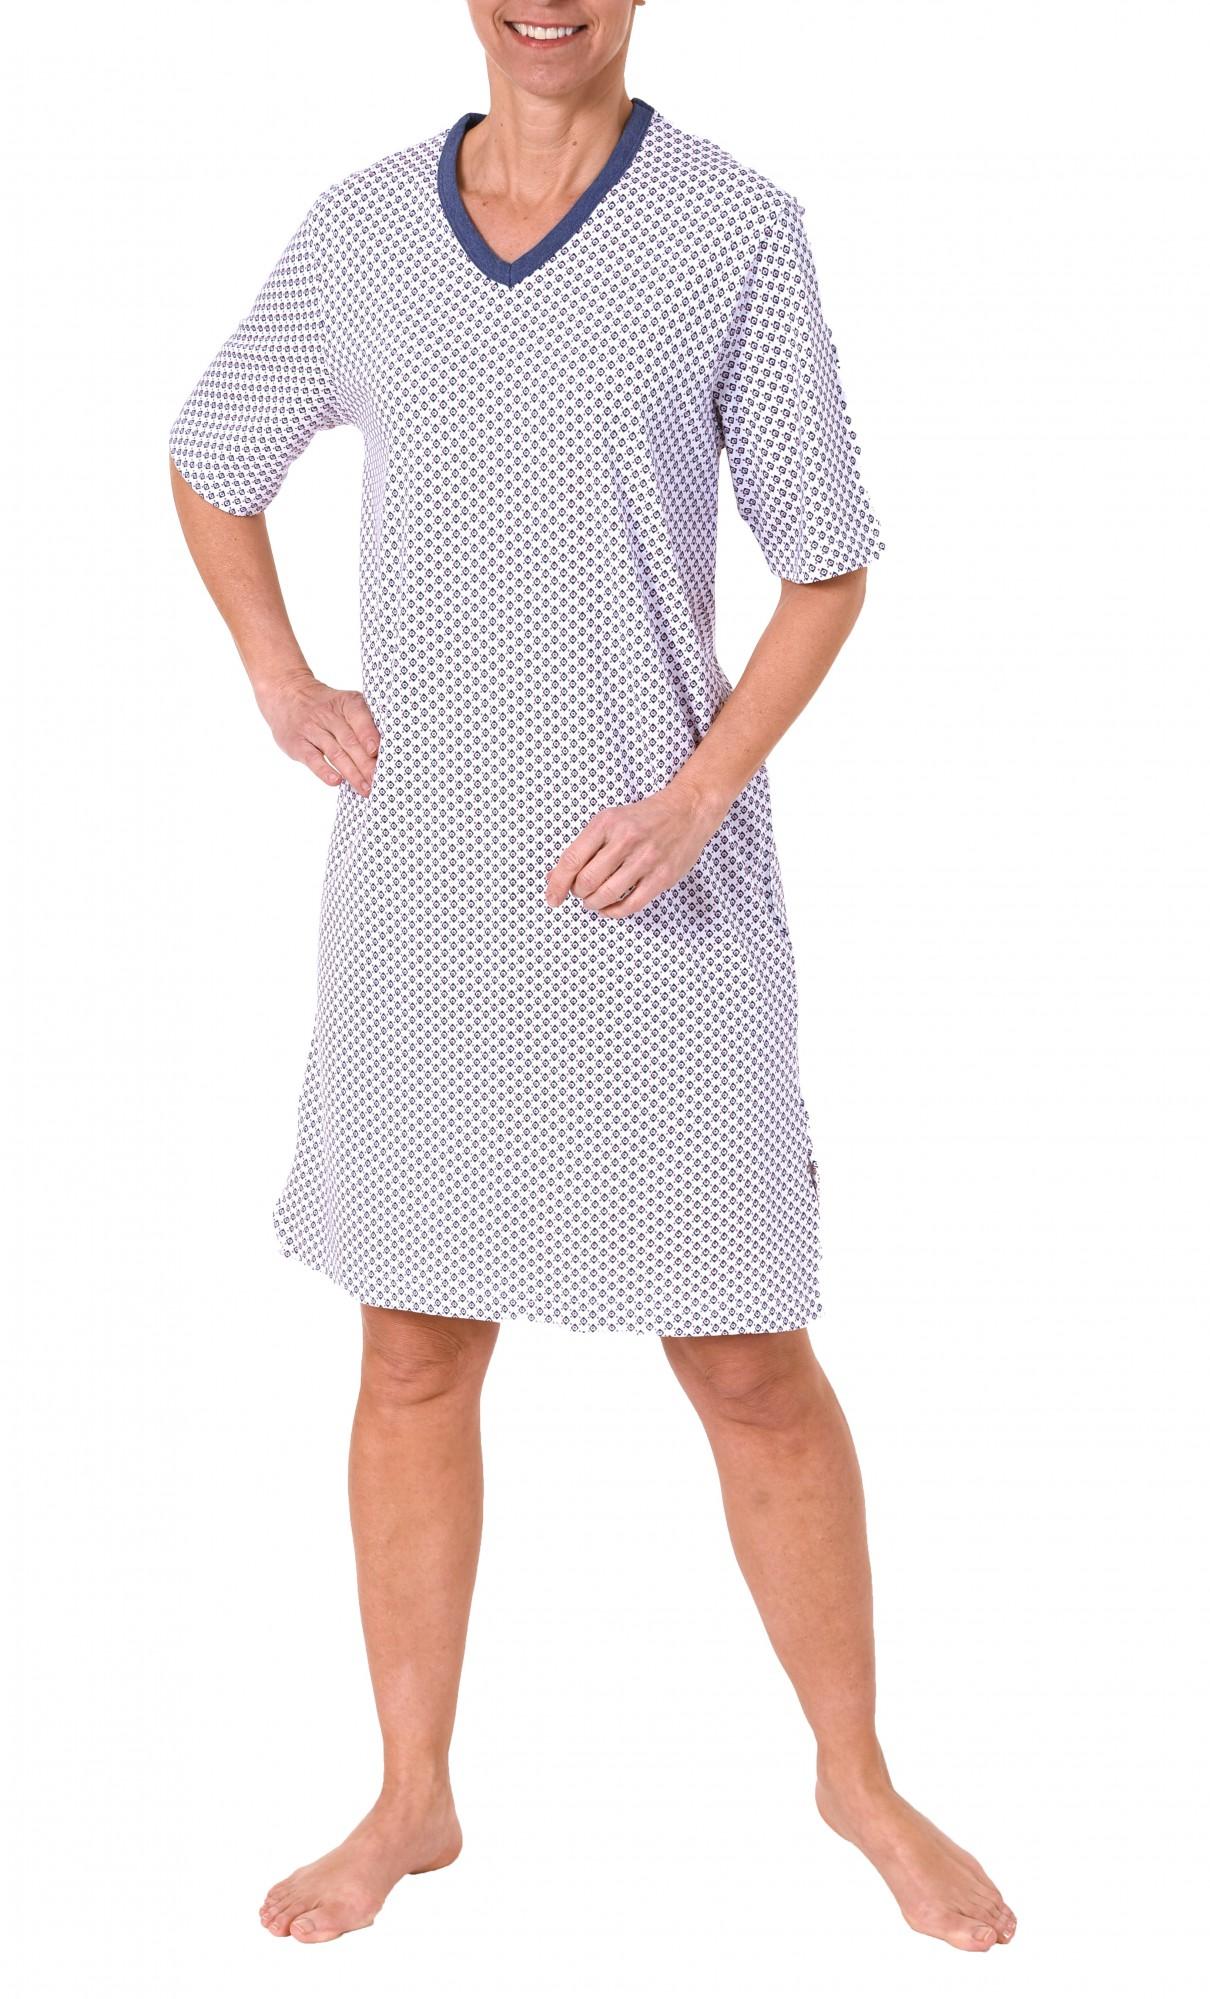 Damen Nachthemd Bigshirt kurzarm mit wunderschönen Minimalprint – 171 213 90 839 – Bild 2